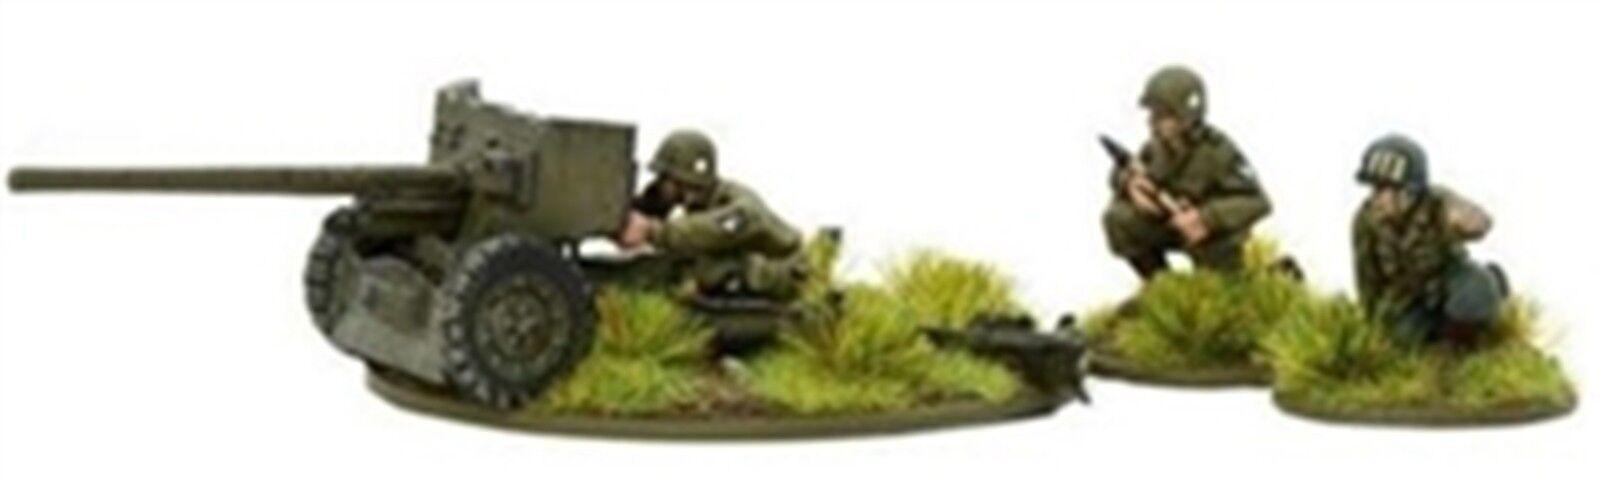 Neue bolt aktion miniatur - uns luft 57mm anti - panzer - waffe 1944-45 spiel 403013104